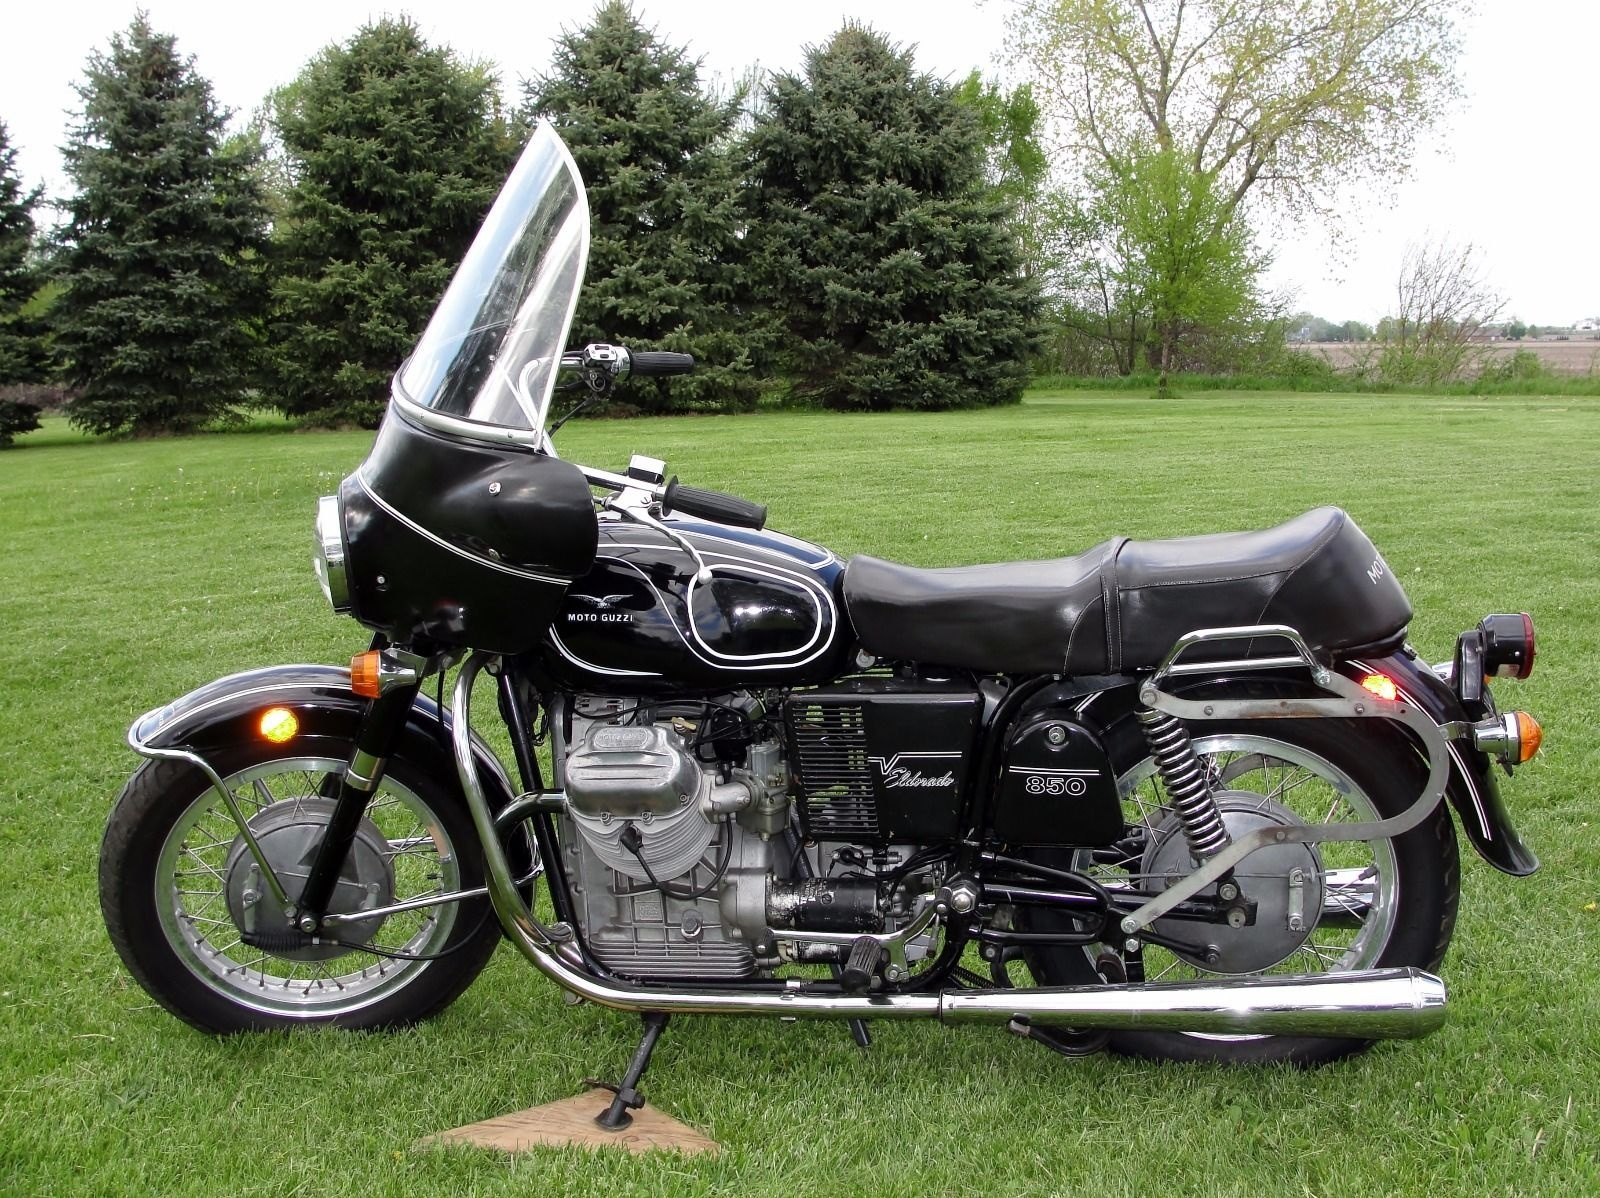 27 years in storage: 1973 moto guzzi 850 eldorado